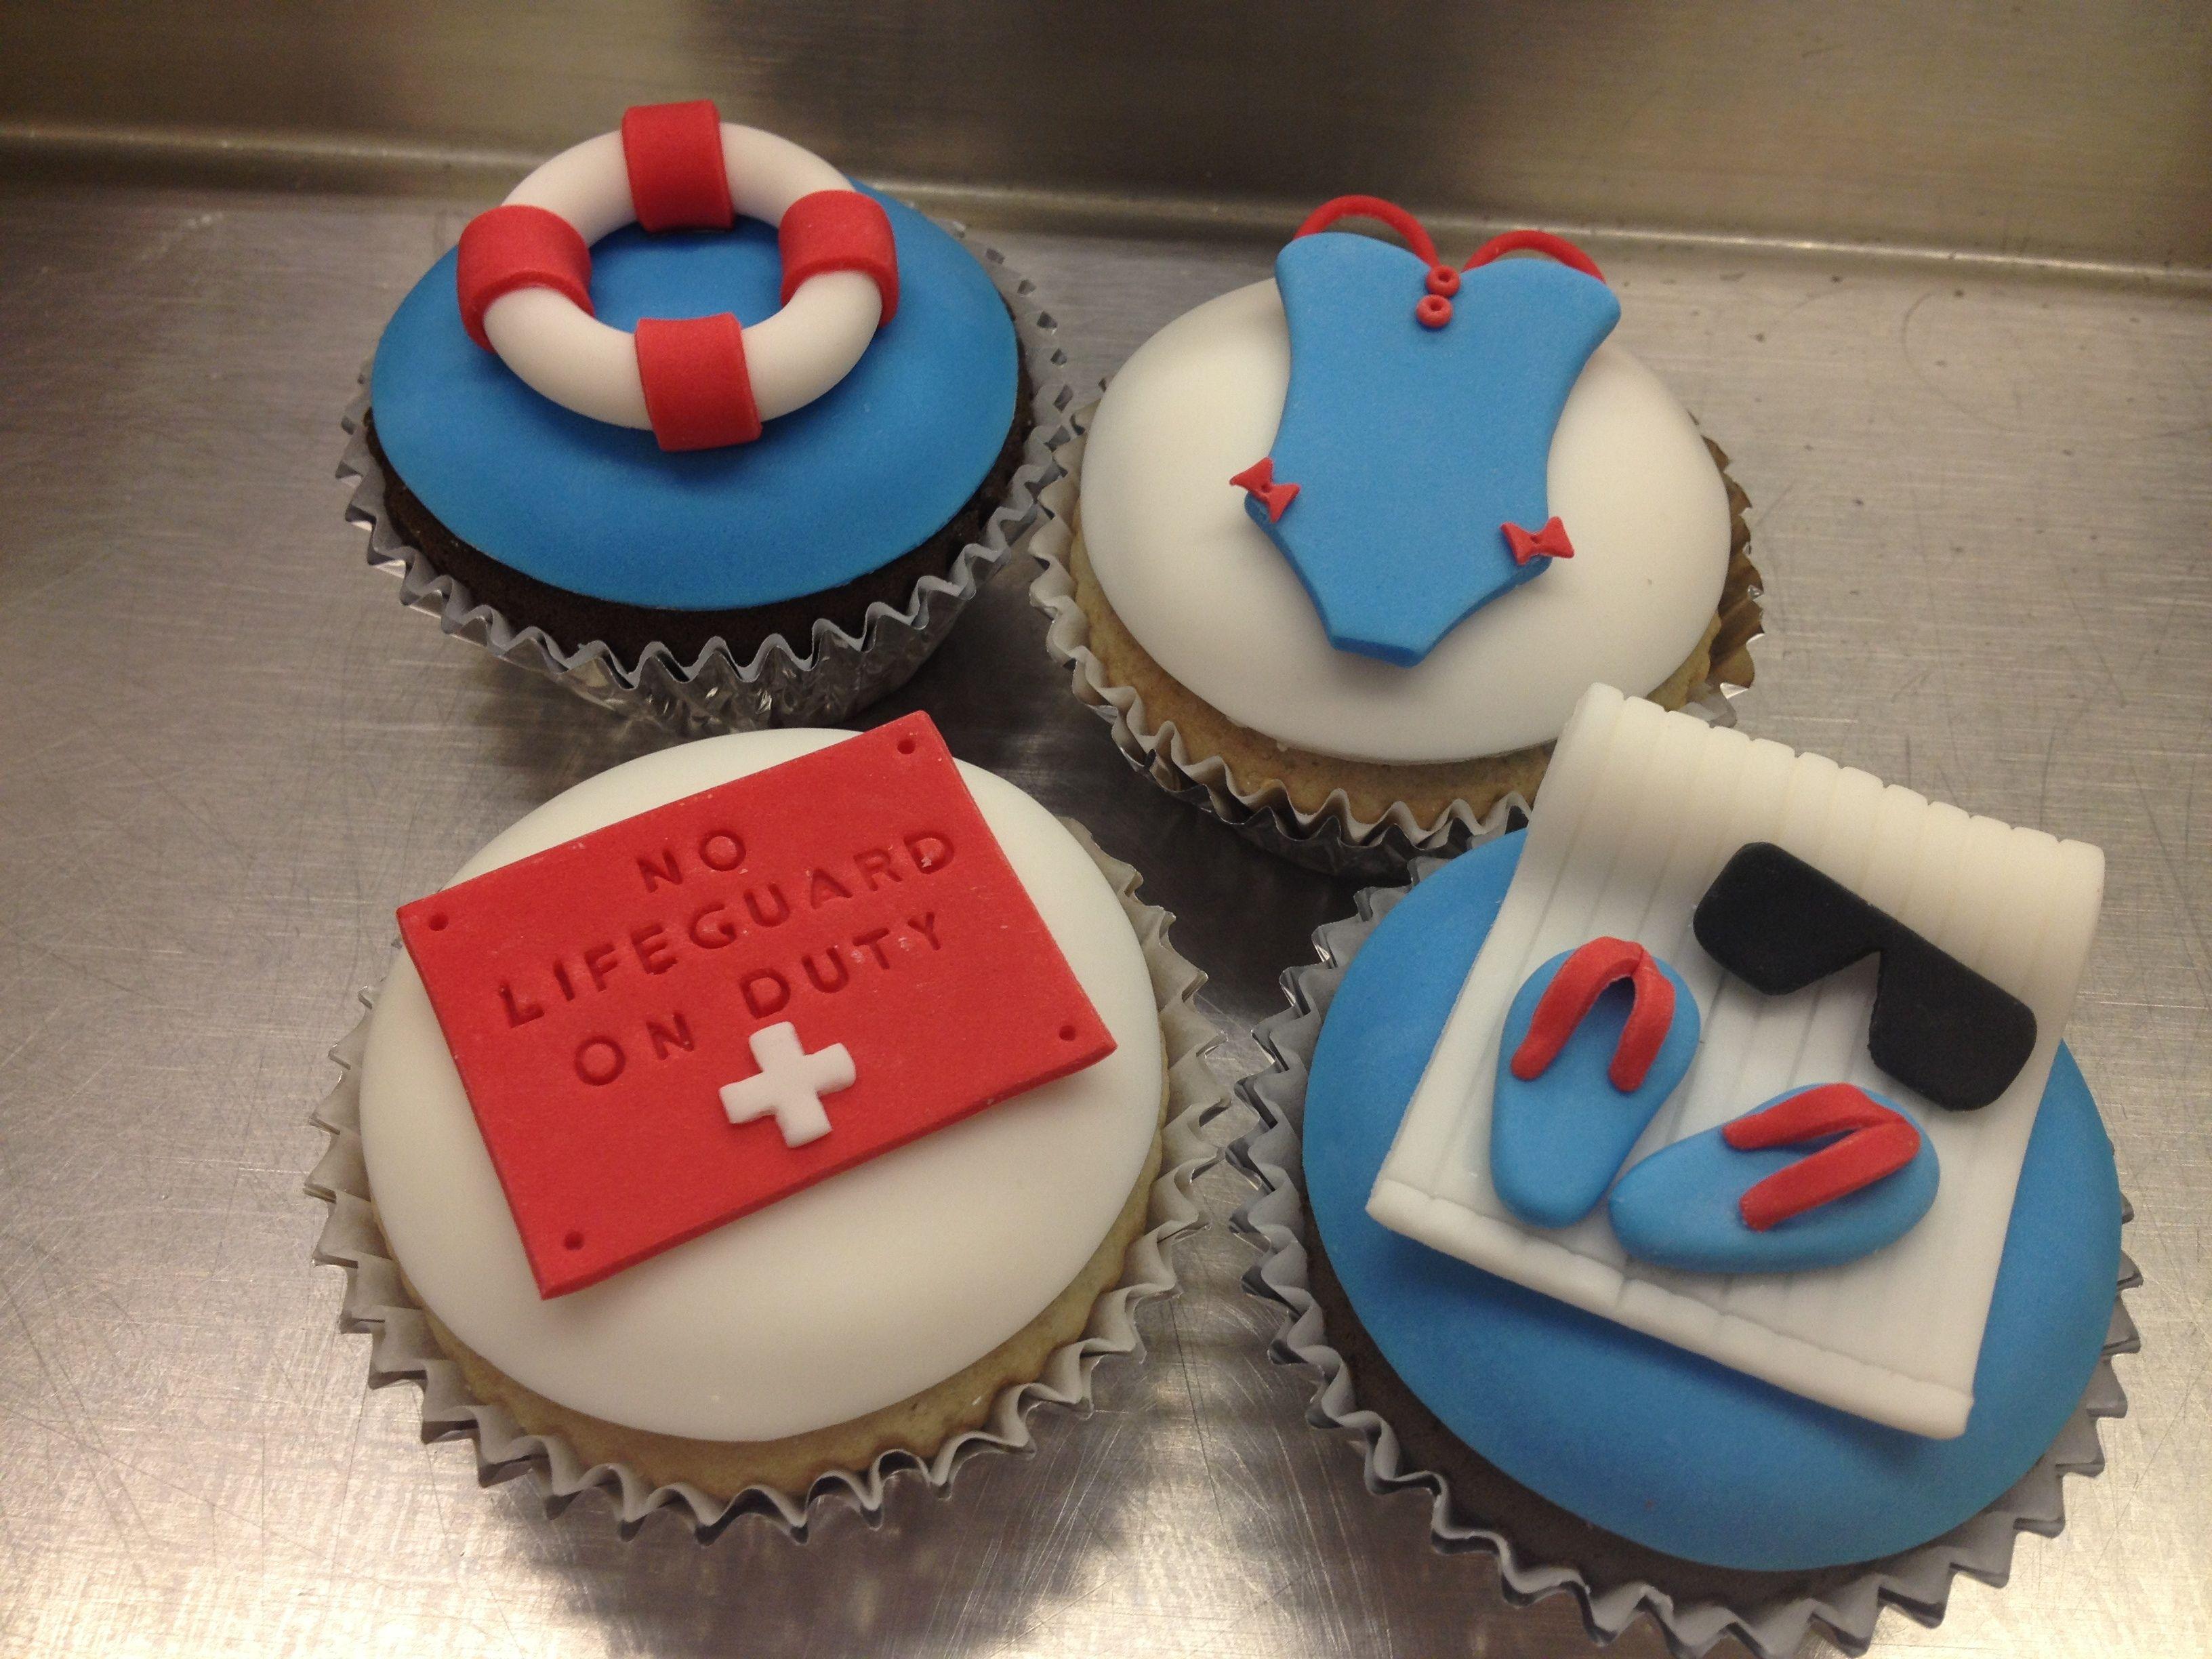 Lifeguard Cupcakes Cupcakes In 2019 Swimming Cake